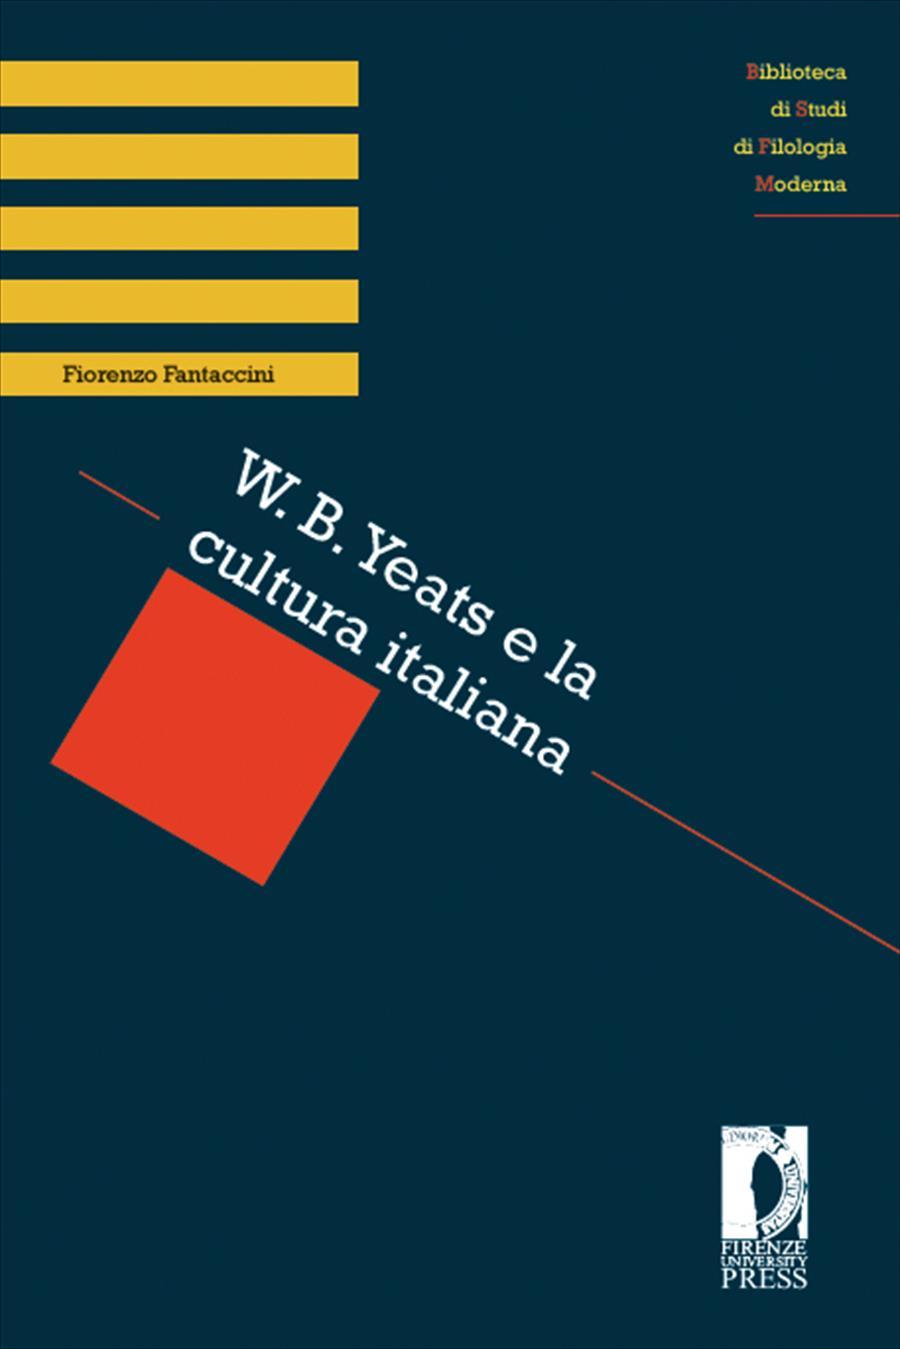 W. B. Yeats e la cultura italiana